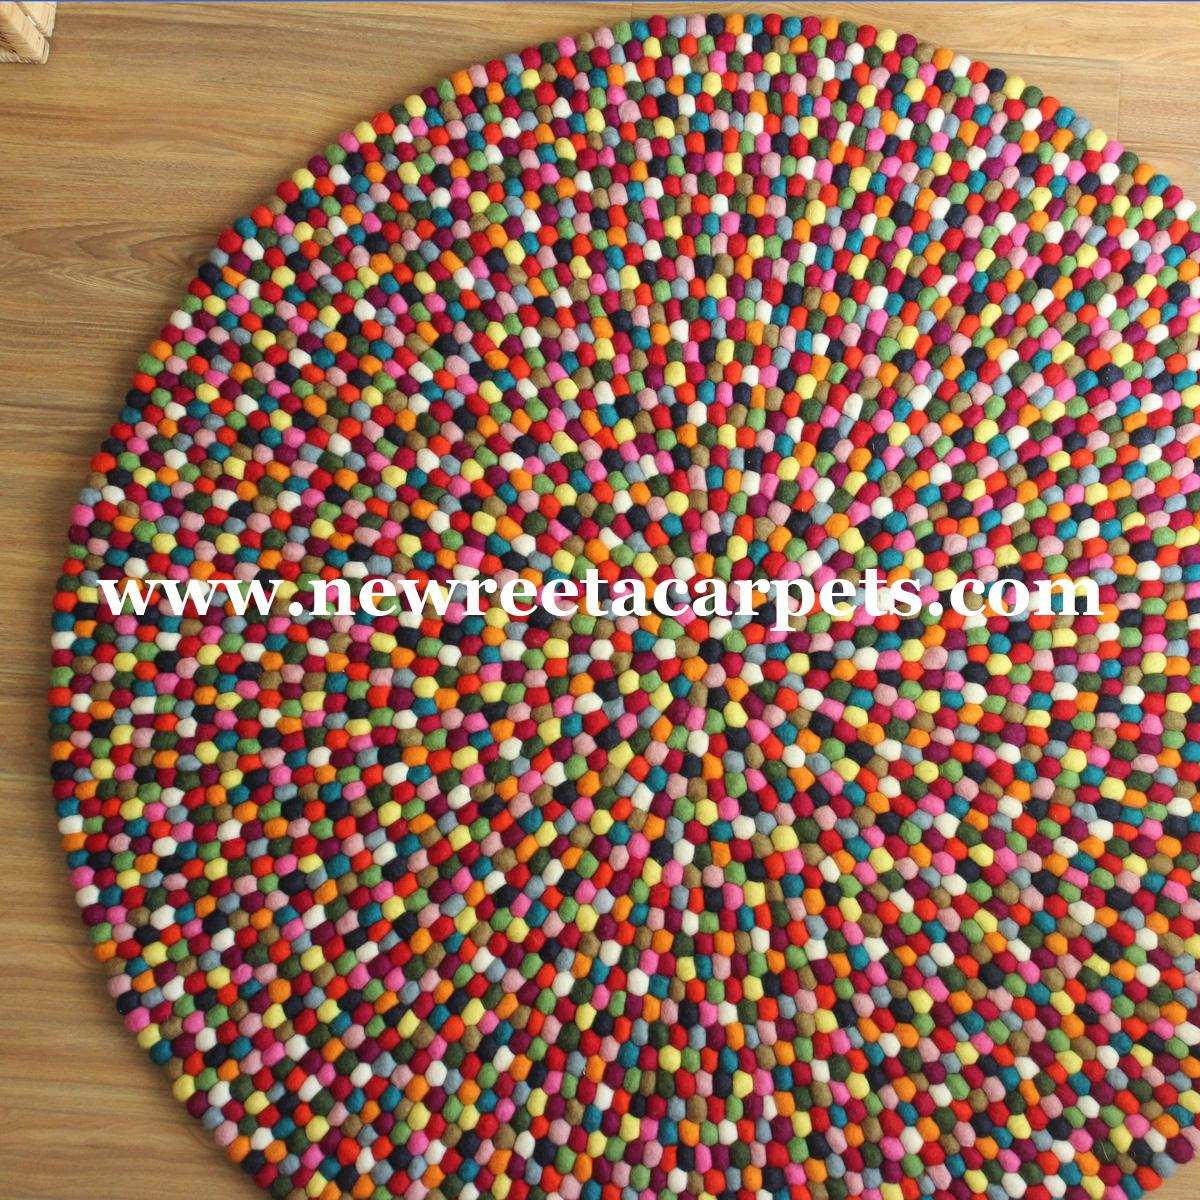 multi color felt ball rug - new reeta carpets nepal